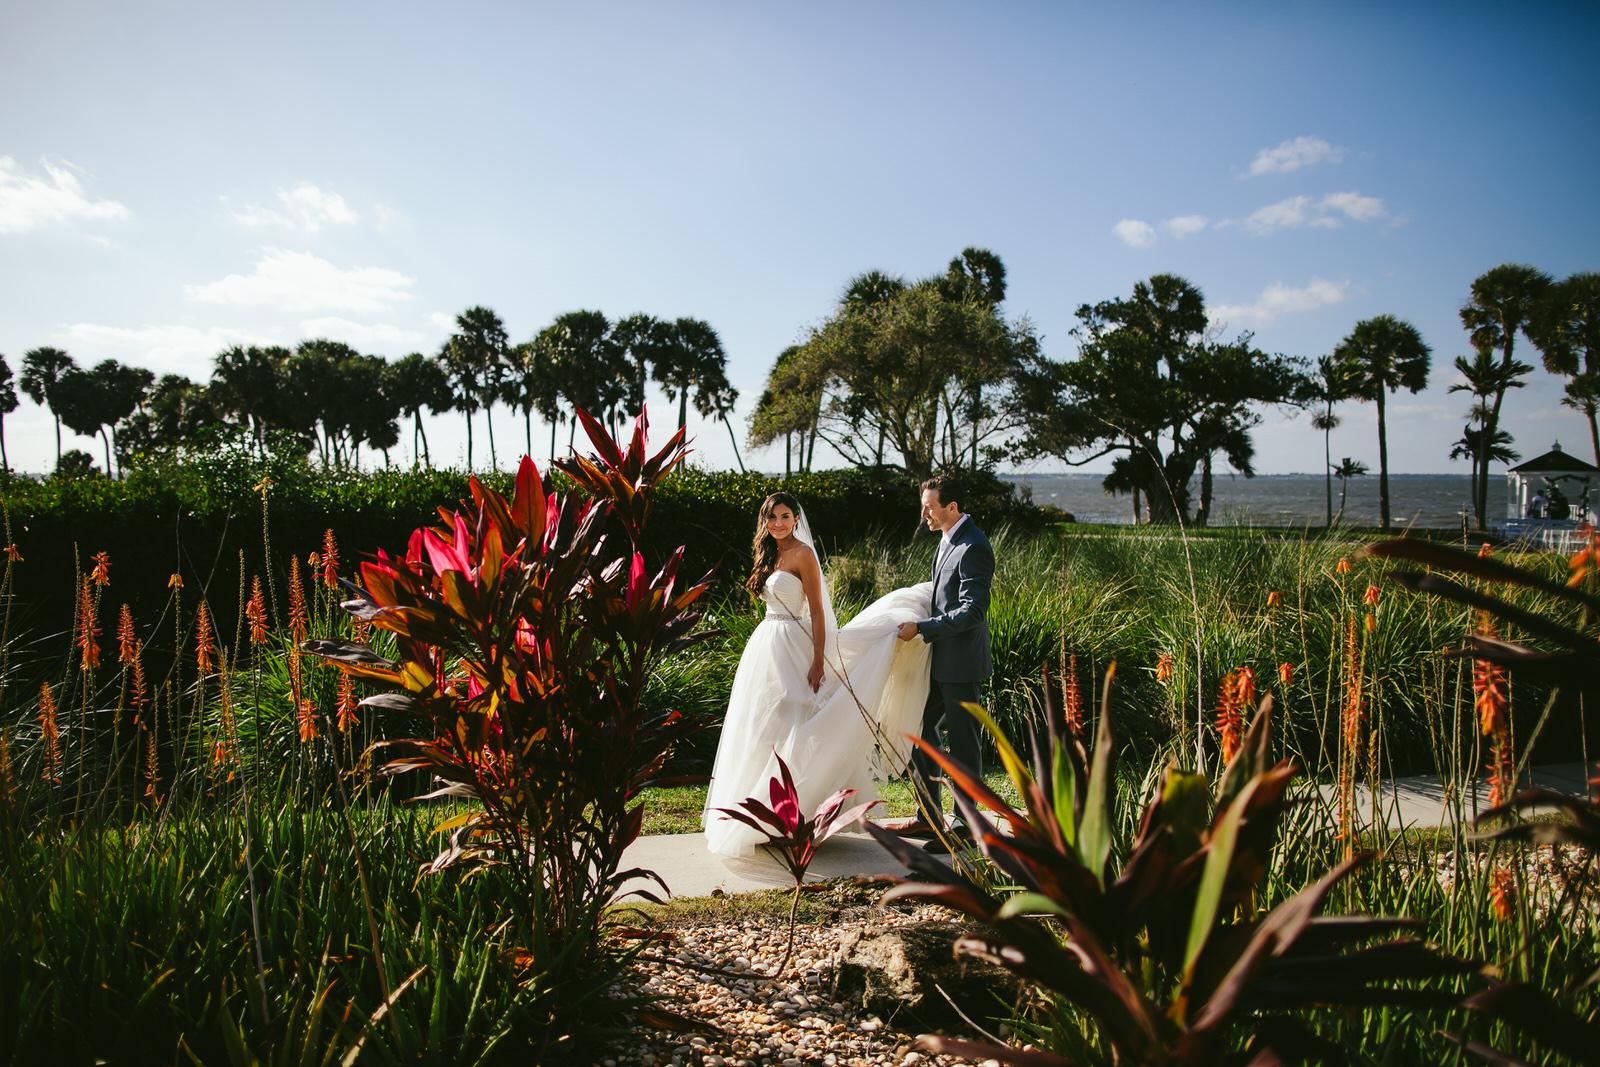 bride_and_groom_jensen_beach_wedding_day-139.jpg